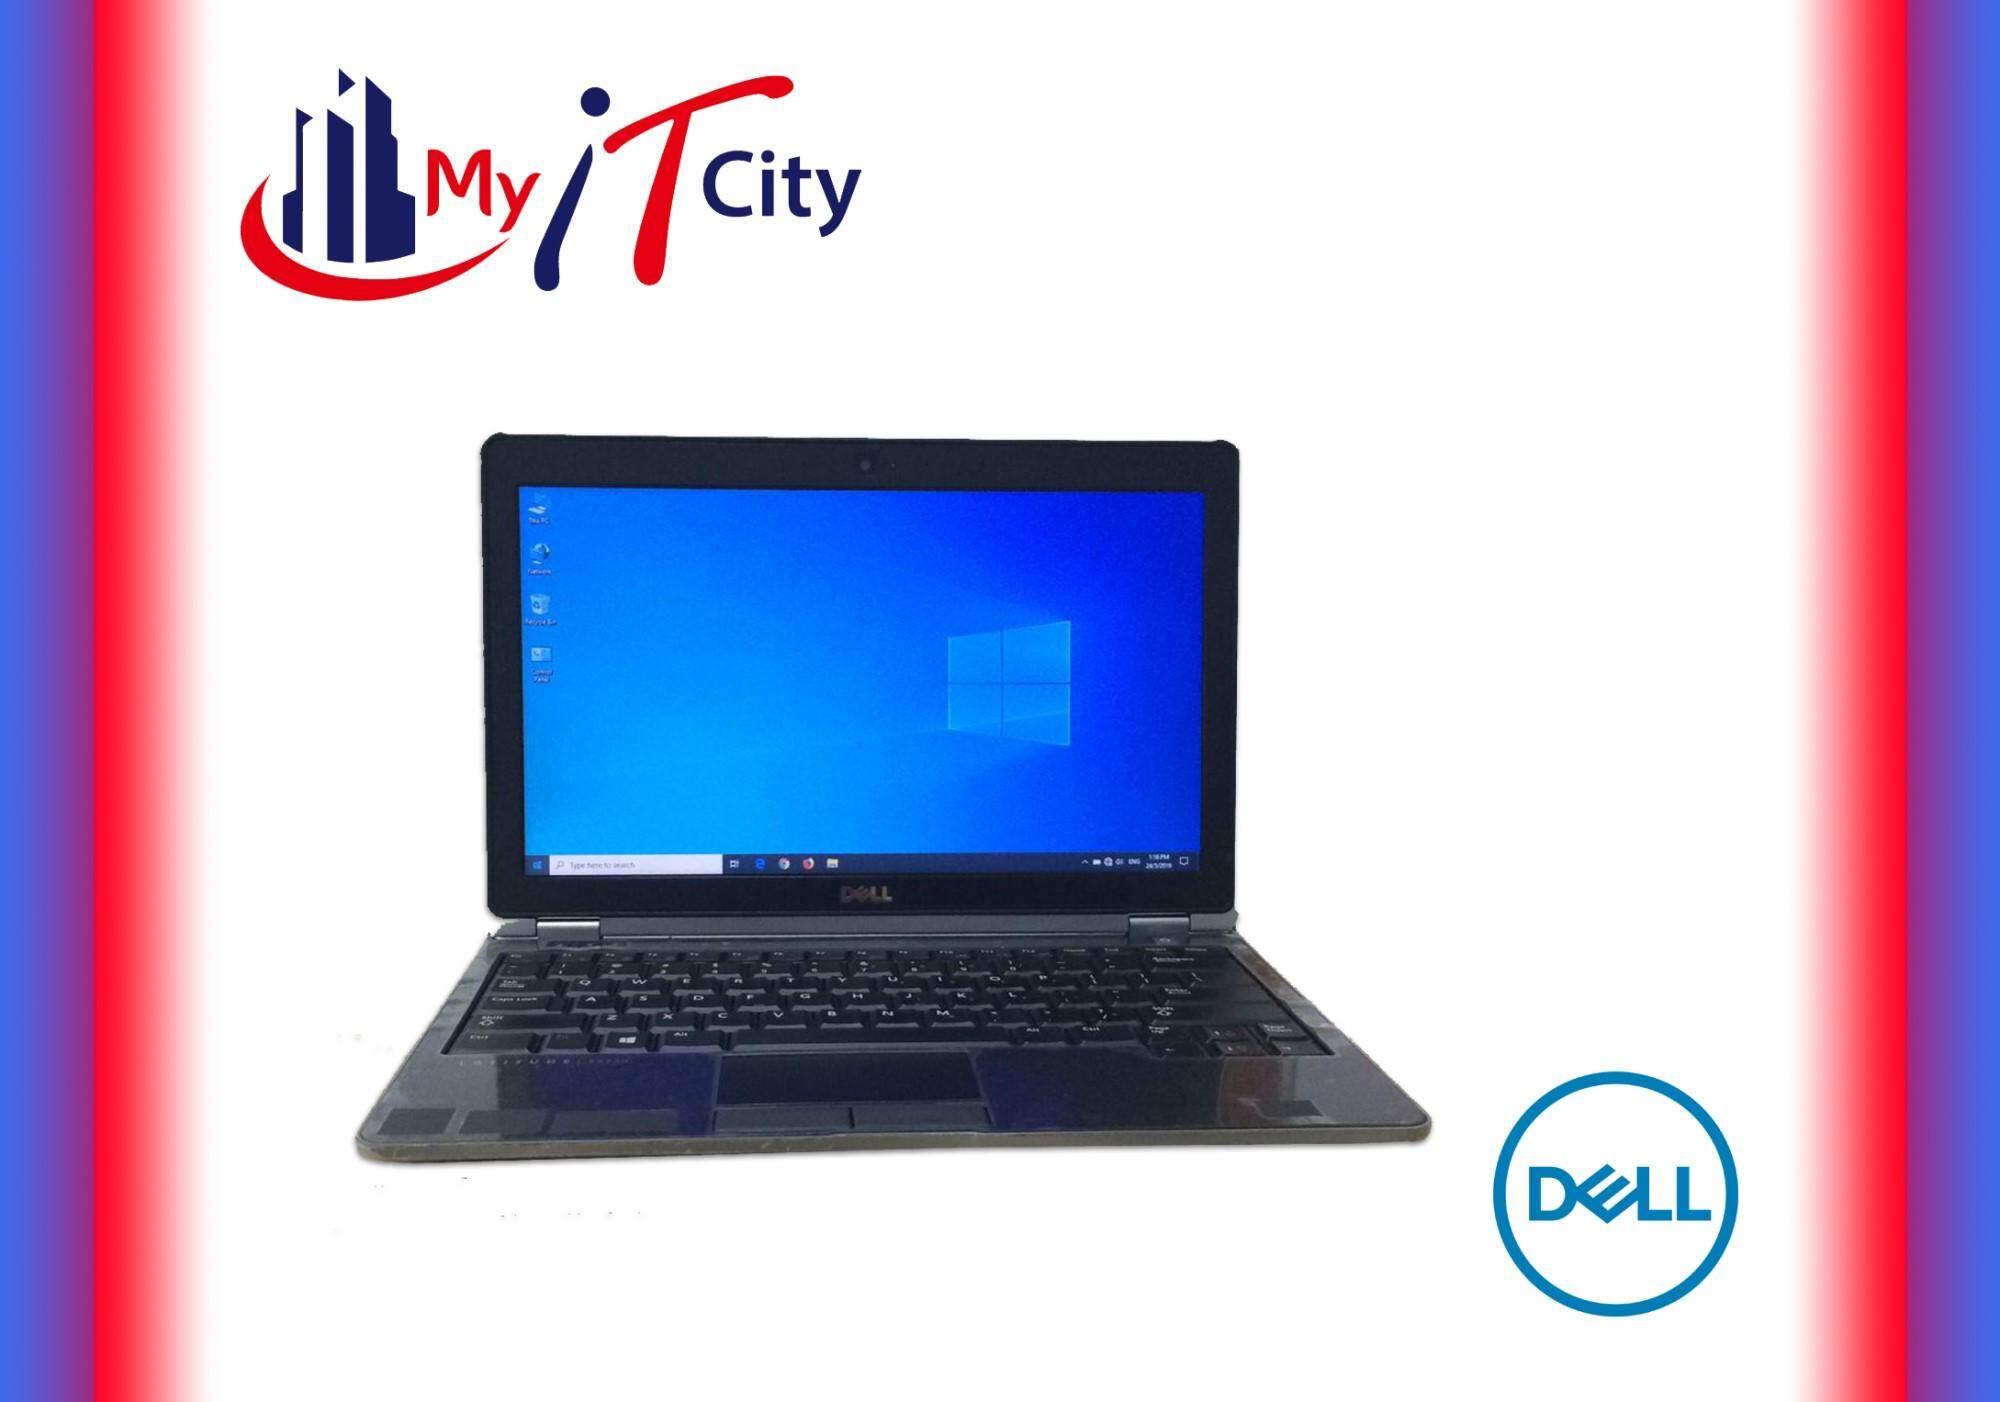 Dell Latitude E6230 - Core i5 3rd Gen / 4GB RAM / 120GB SSD / Windows 7 Pro / 3 Months Warranty (Refurbished) Malaysia